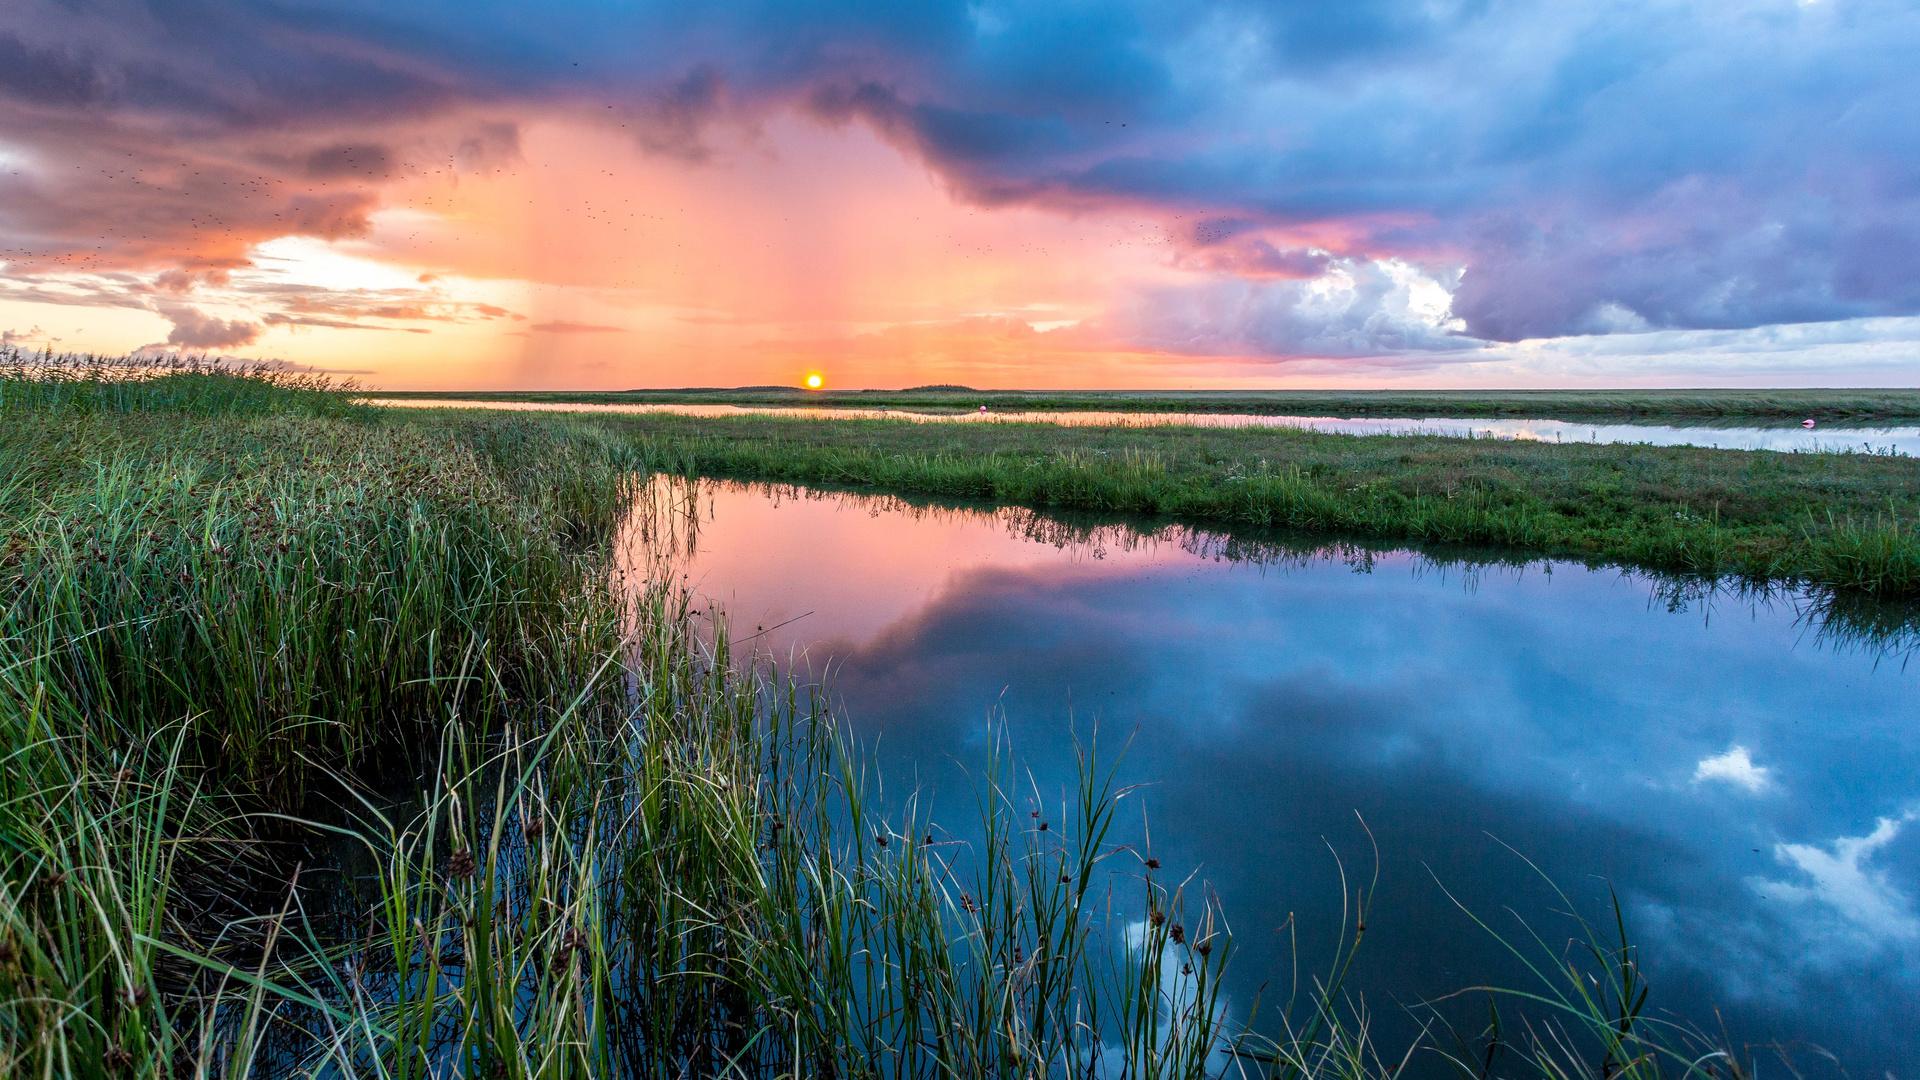 Sonnenaugang auf Fanö / Dänemark